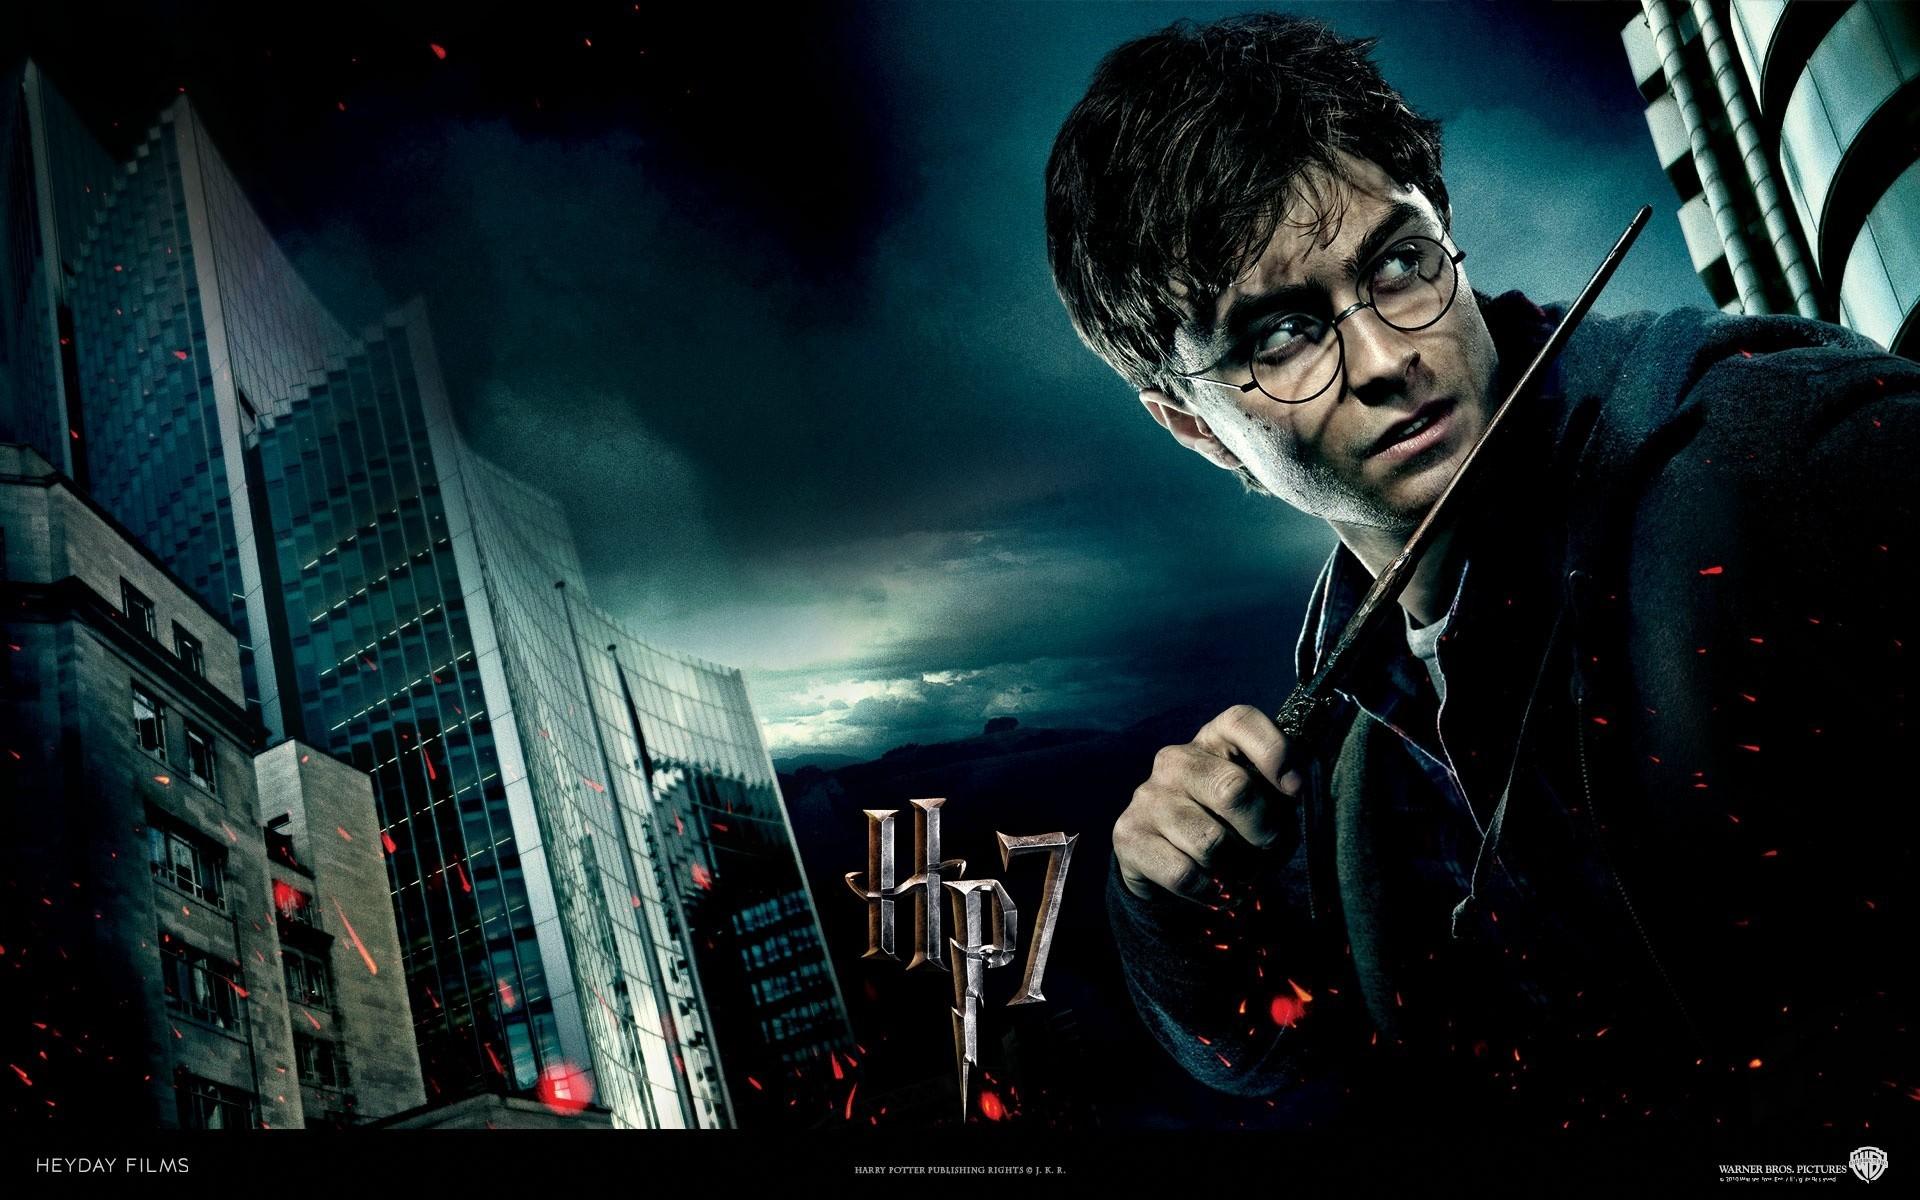 Beautiful Wallpaper Harry Potter Dual Monitor - Harry-Potter-7-Wallpaper  Best Photo Reference_94393.jpg